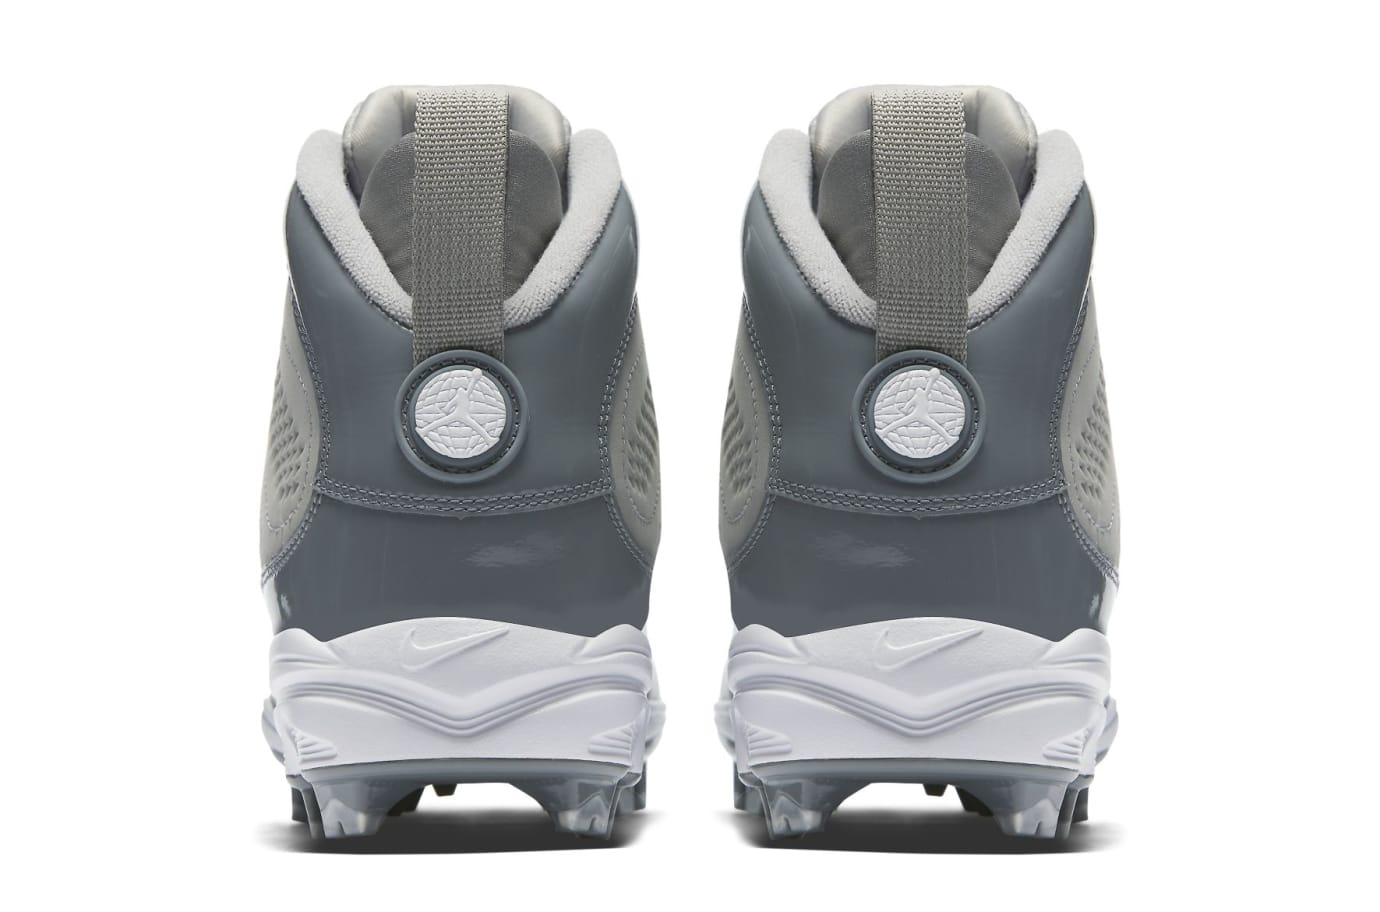 Air Jordan 9 IX MCS Baseball Cleats Cool Grey Heel